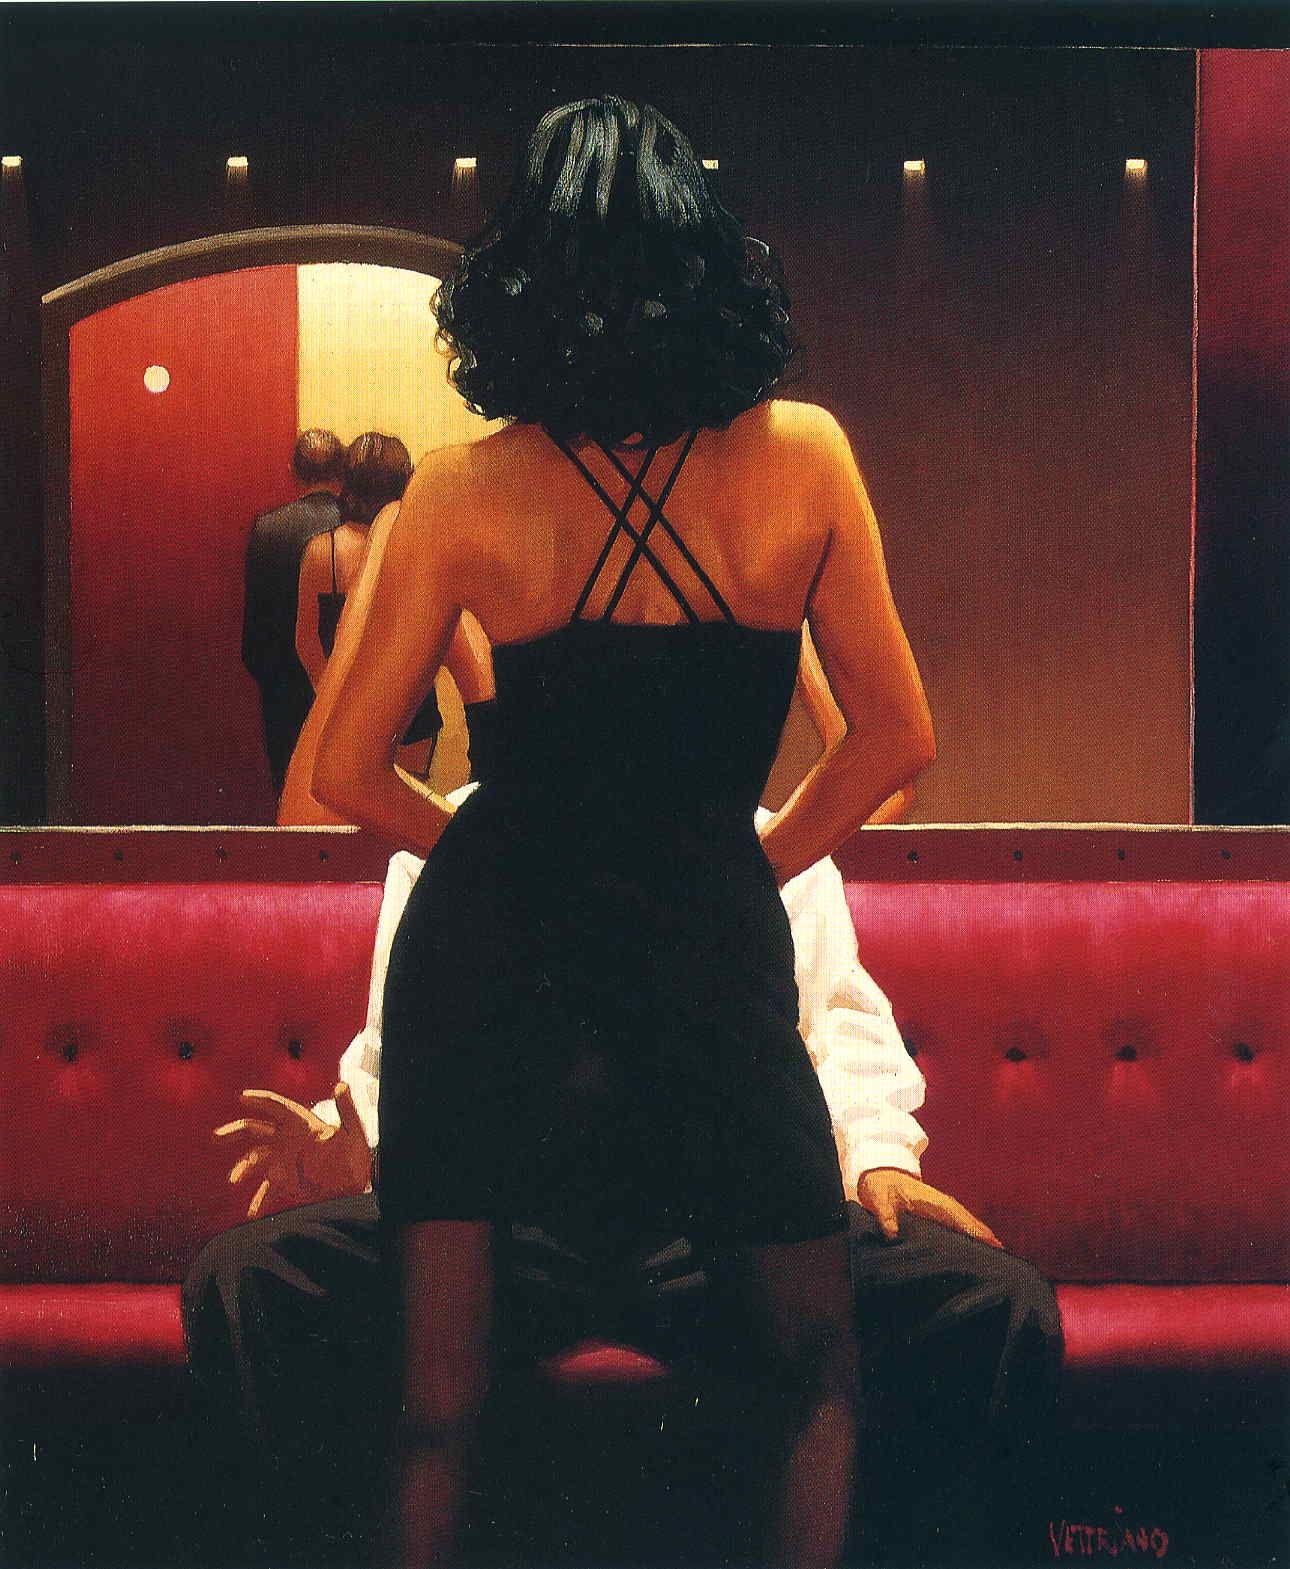 Jack Vettriano - Queen Of The Waltzer